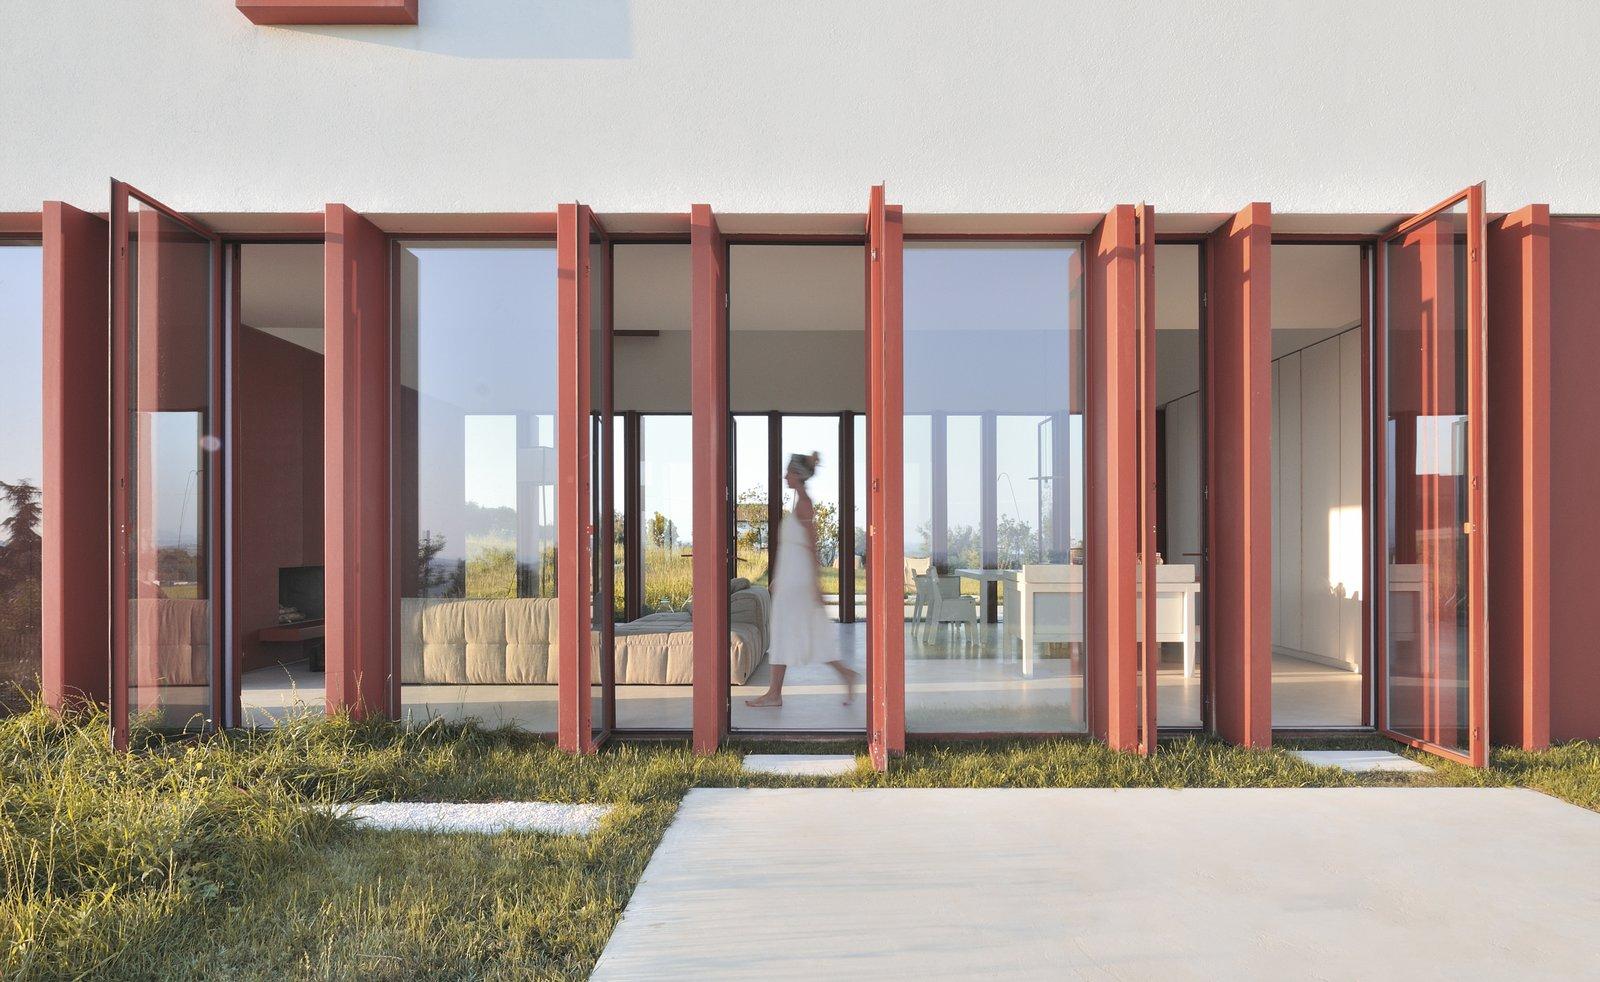 Simone Subissati Border Crossing House hallway with swing doors